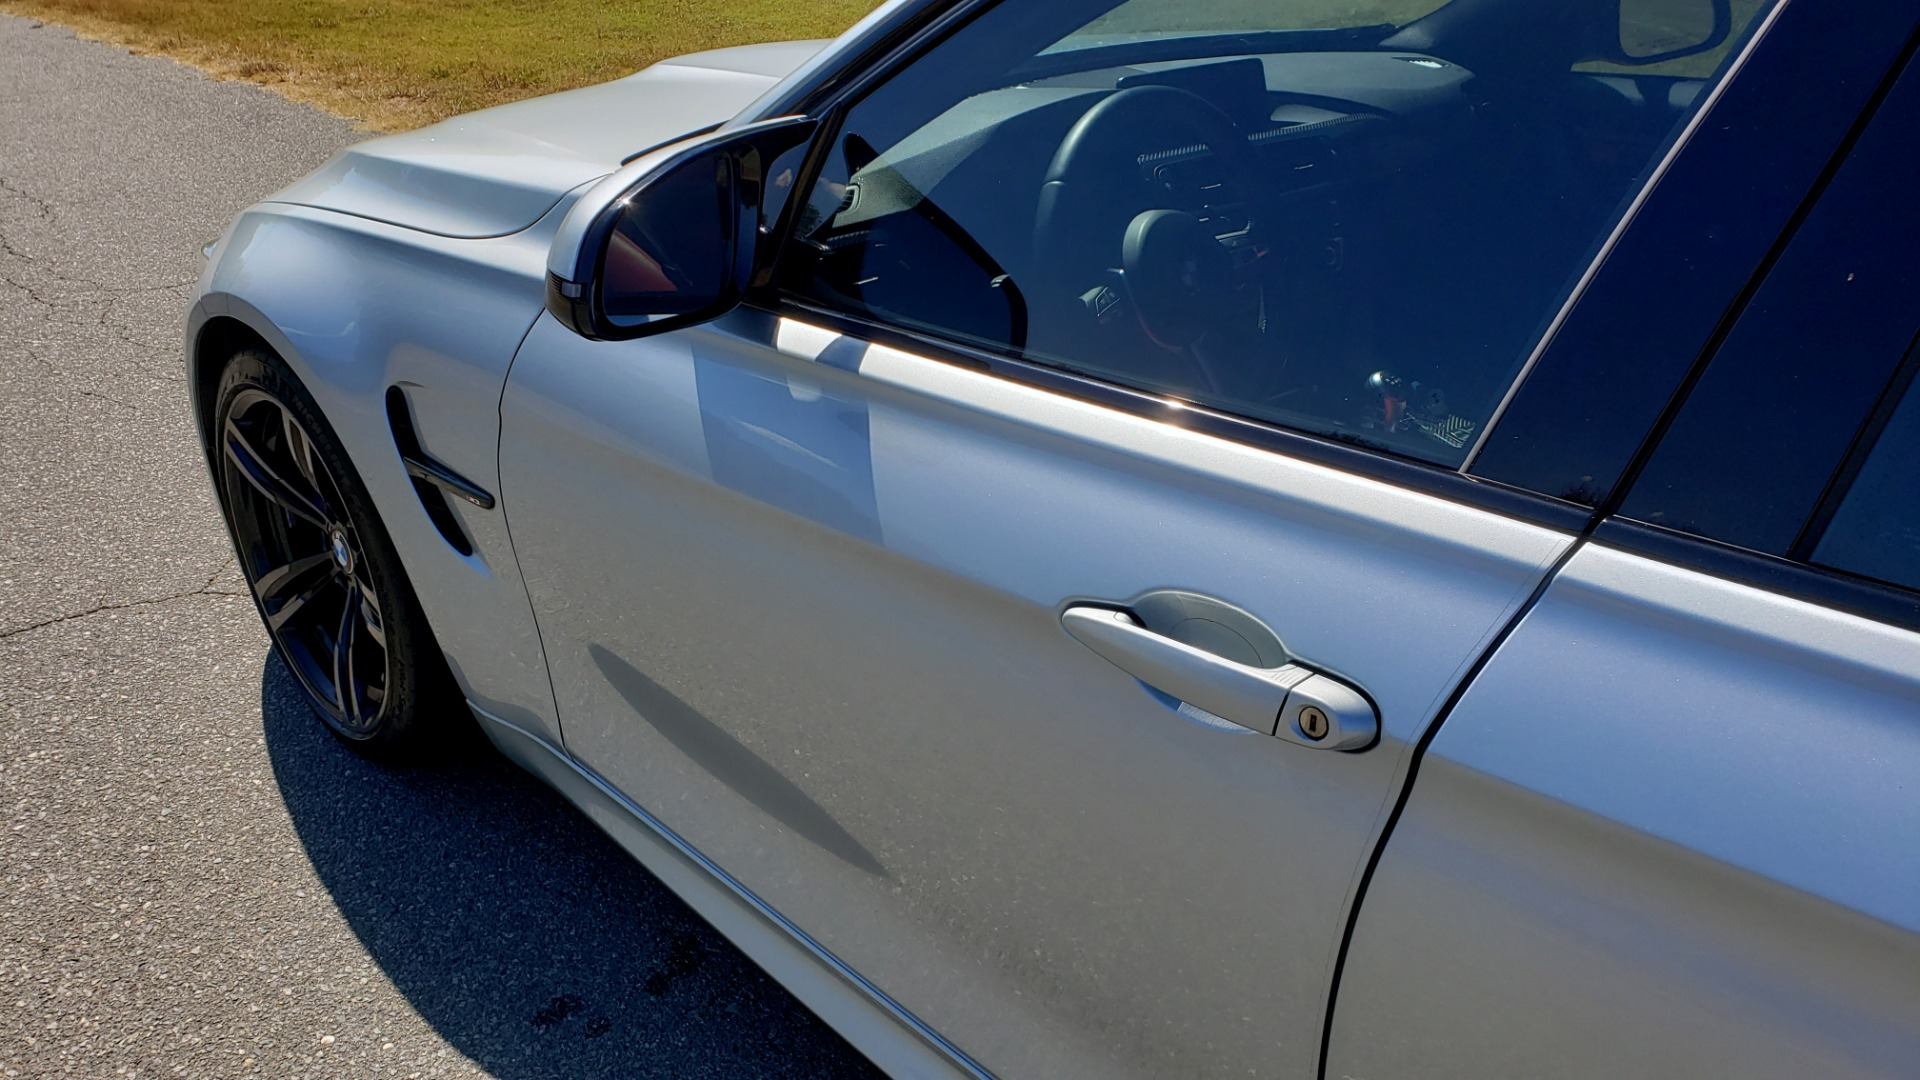 Used 2015 BMW M3 EXECUTIVE PKG / NAV / CAMERA / HUD / CARBON FIBER ROOF for sale Sold at Formula Imports in Charlotte NC 28227 4